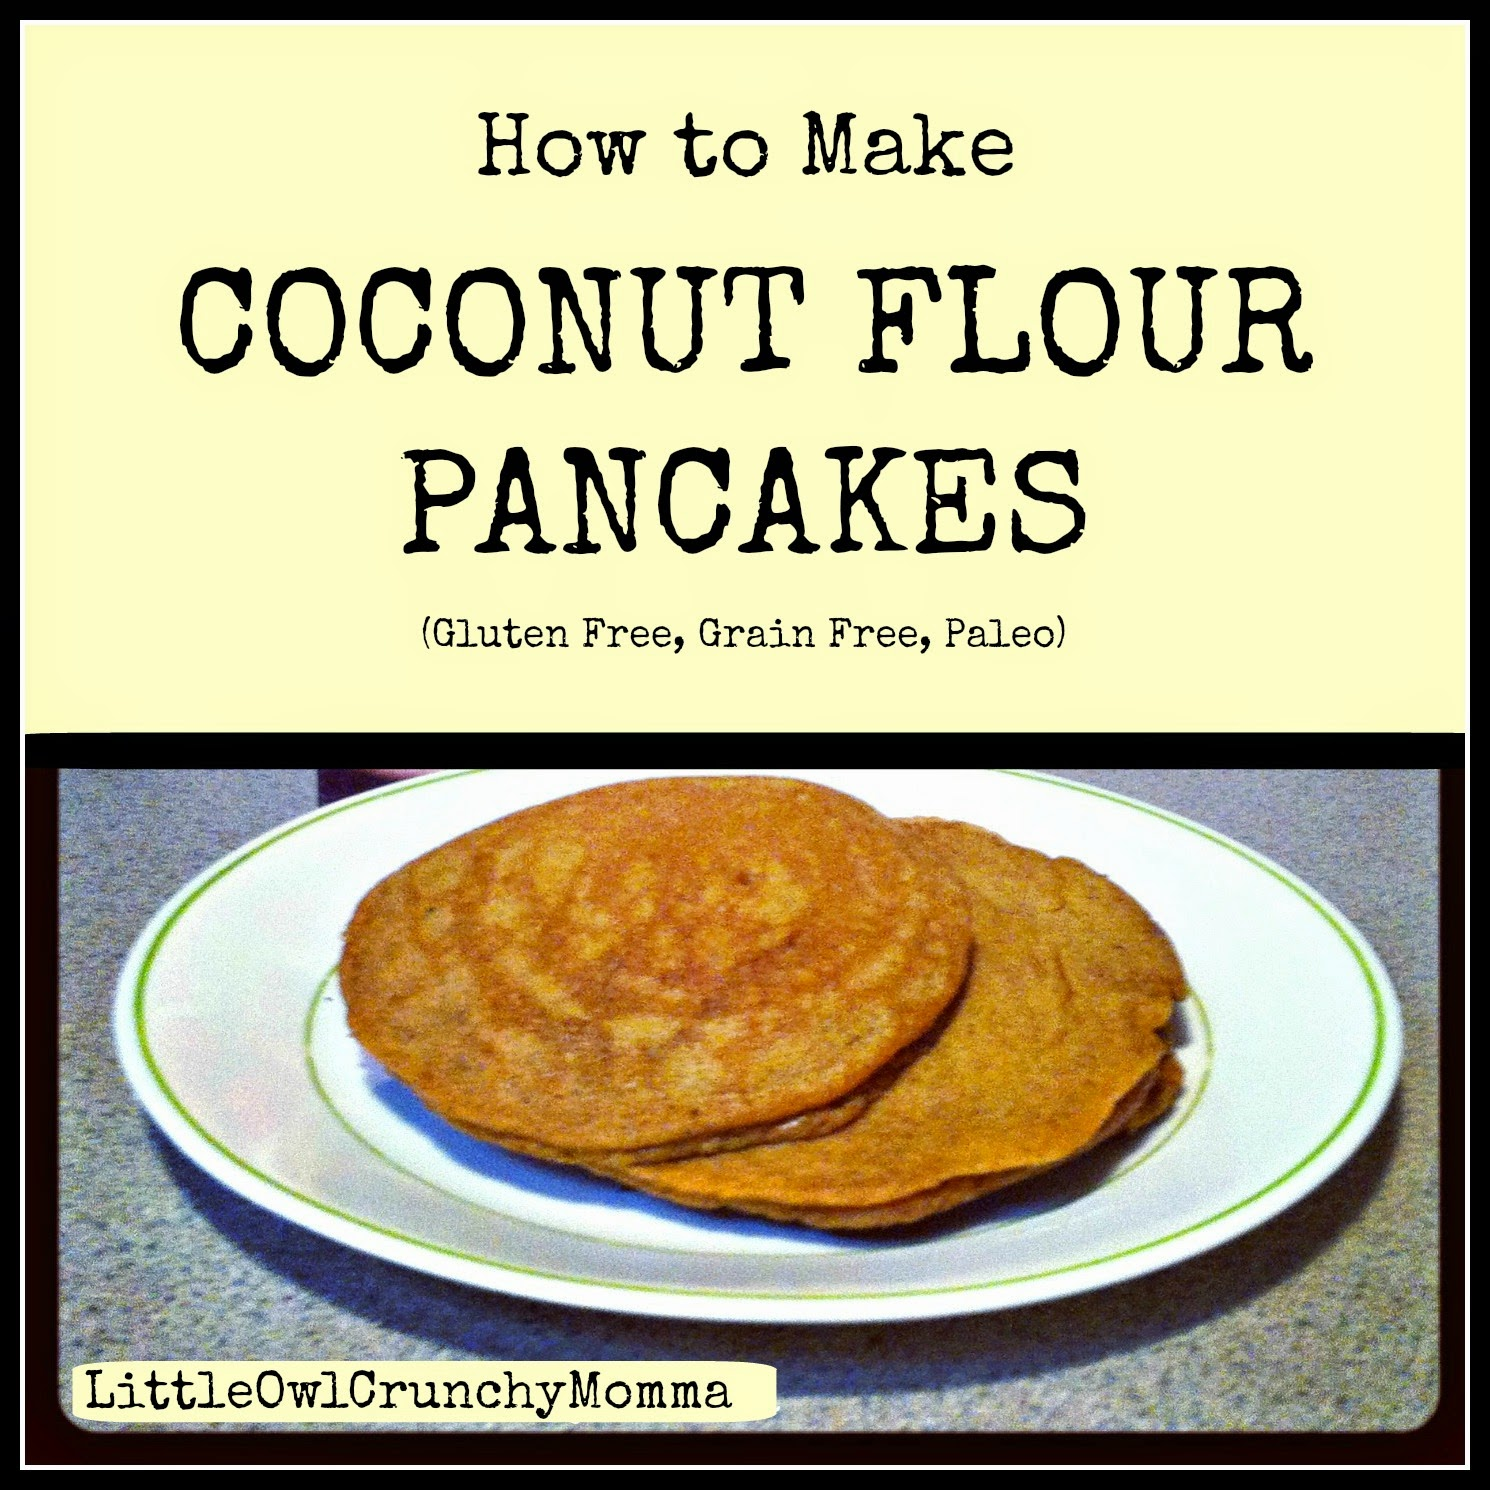 LittleOwlCrunchyMomma: How to Make Coconut Flour Pancakes ...